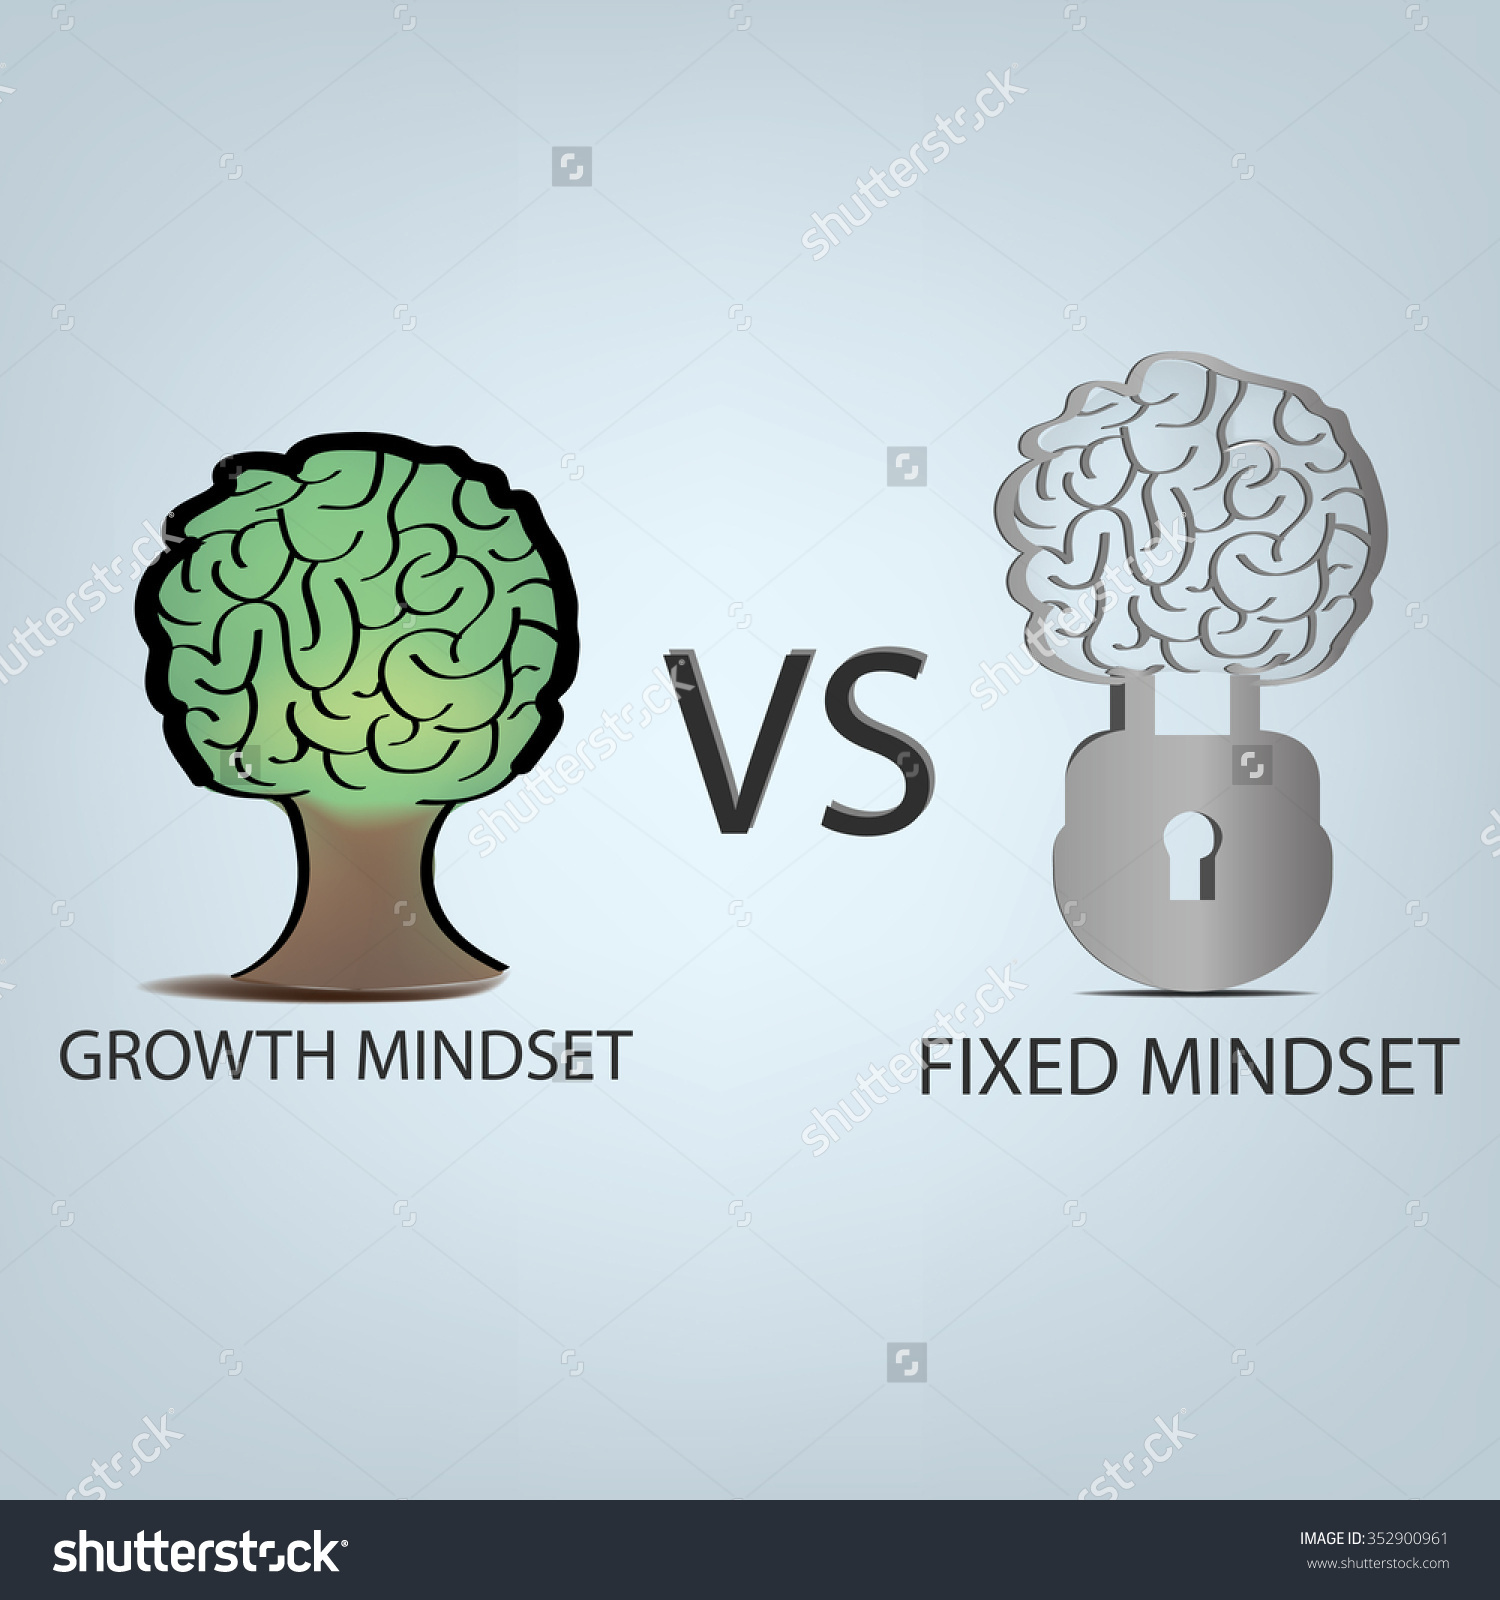 Mind clipart mindset Clipart Panda Mindset mindset Clip